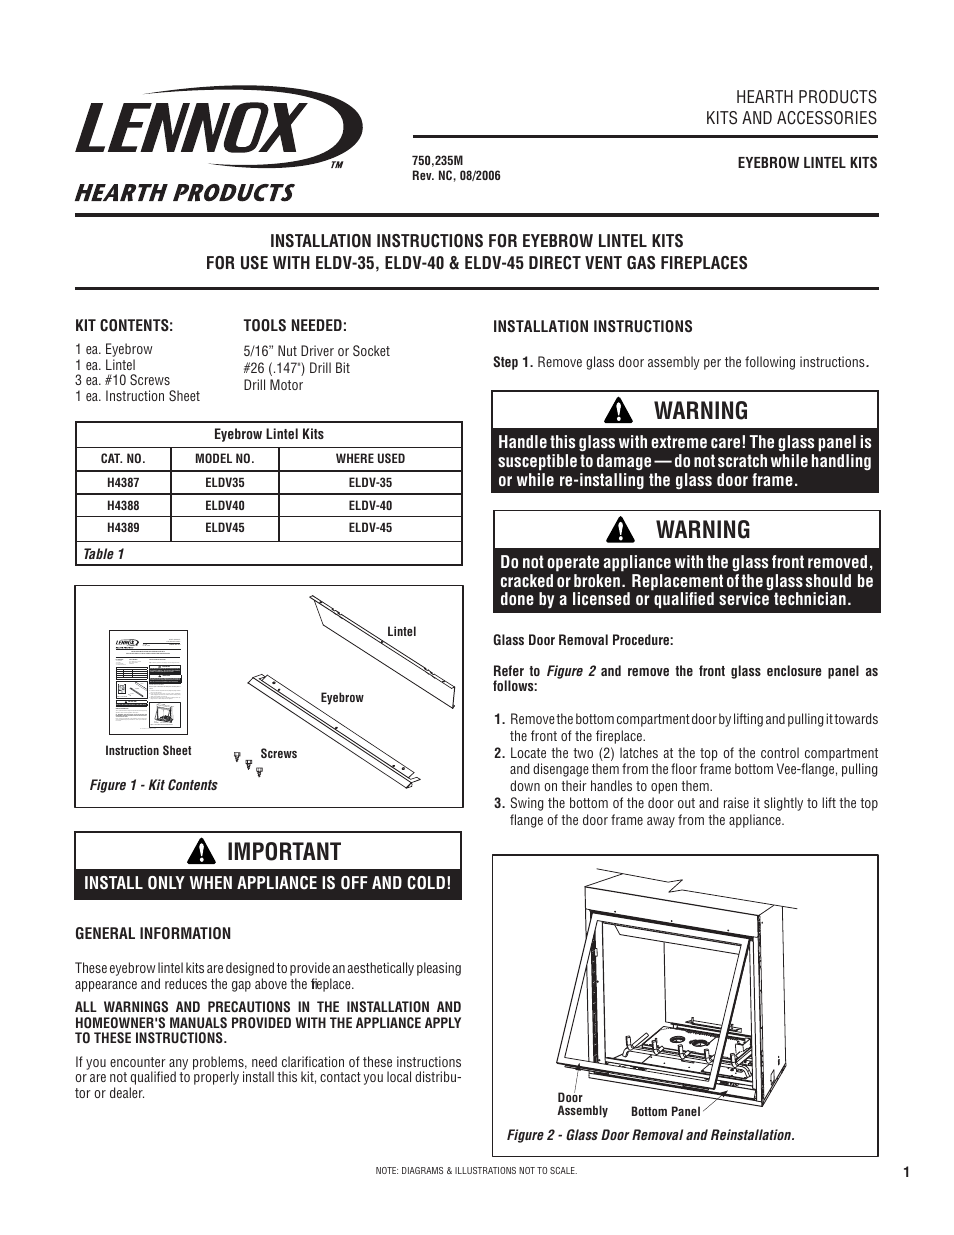 Lennox Hearth Eyebrow Lintel Kit ELDV 35 User Manual